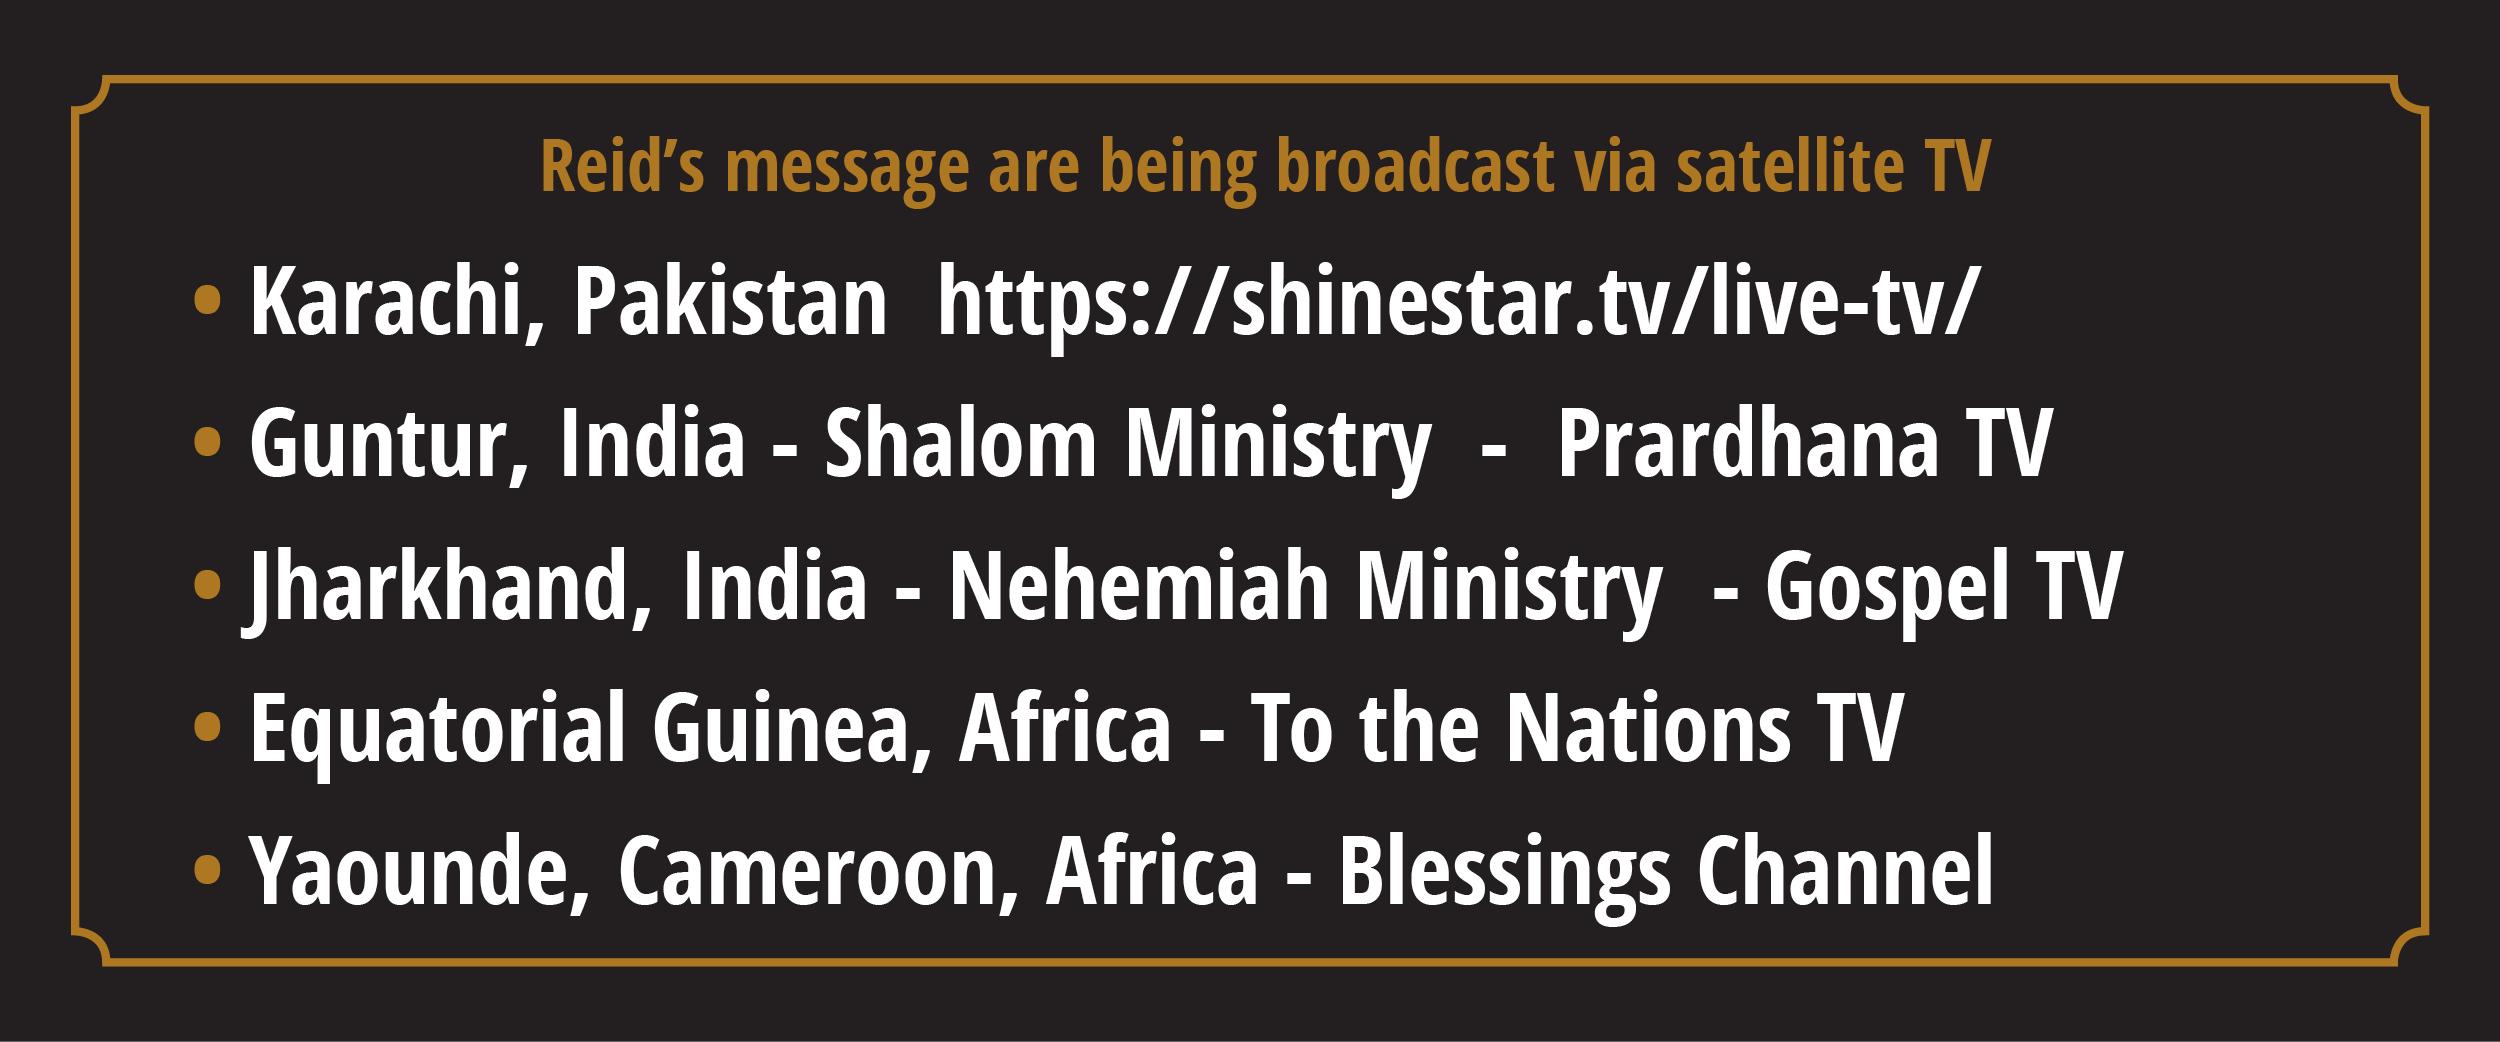 outreach broadcast schedule